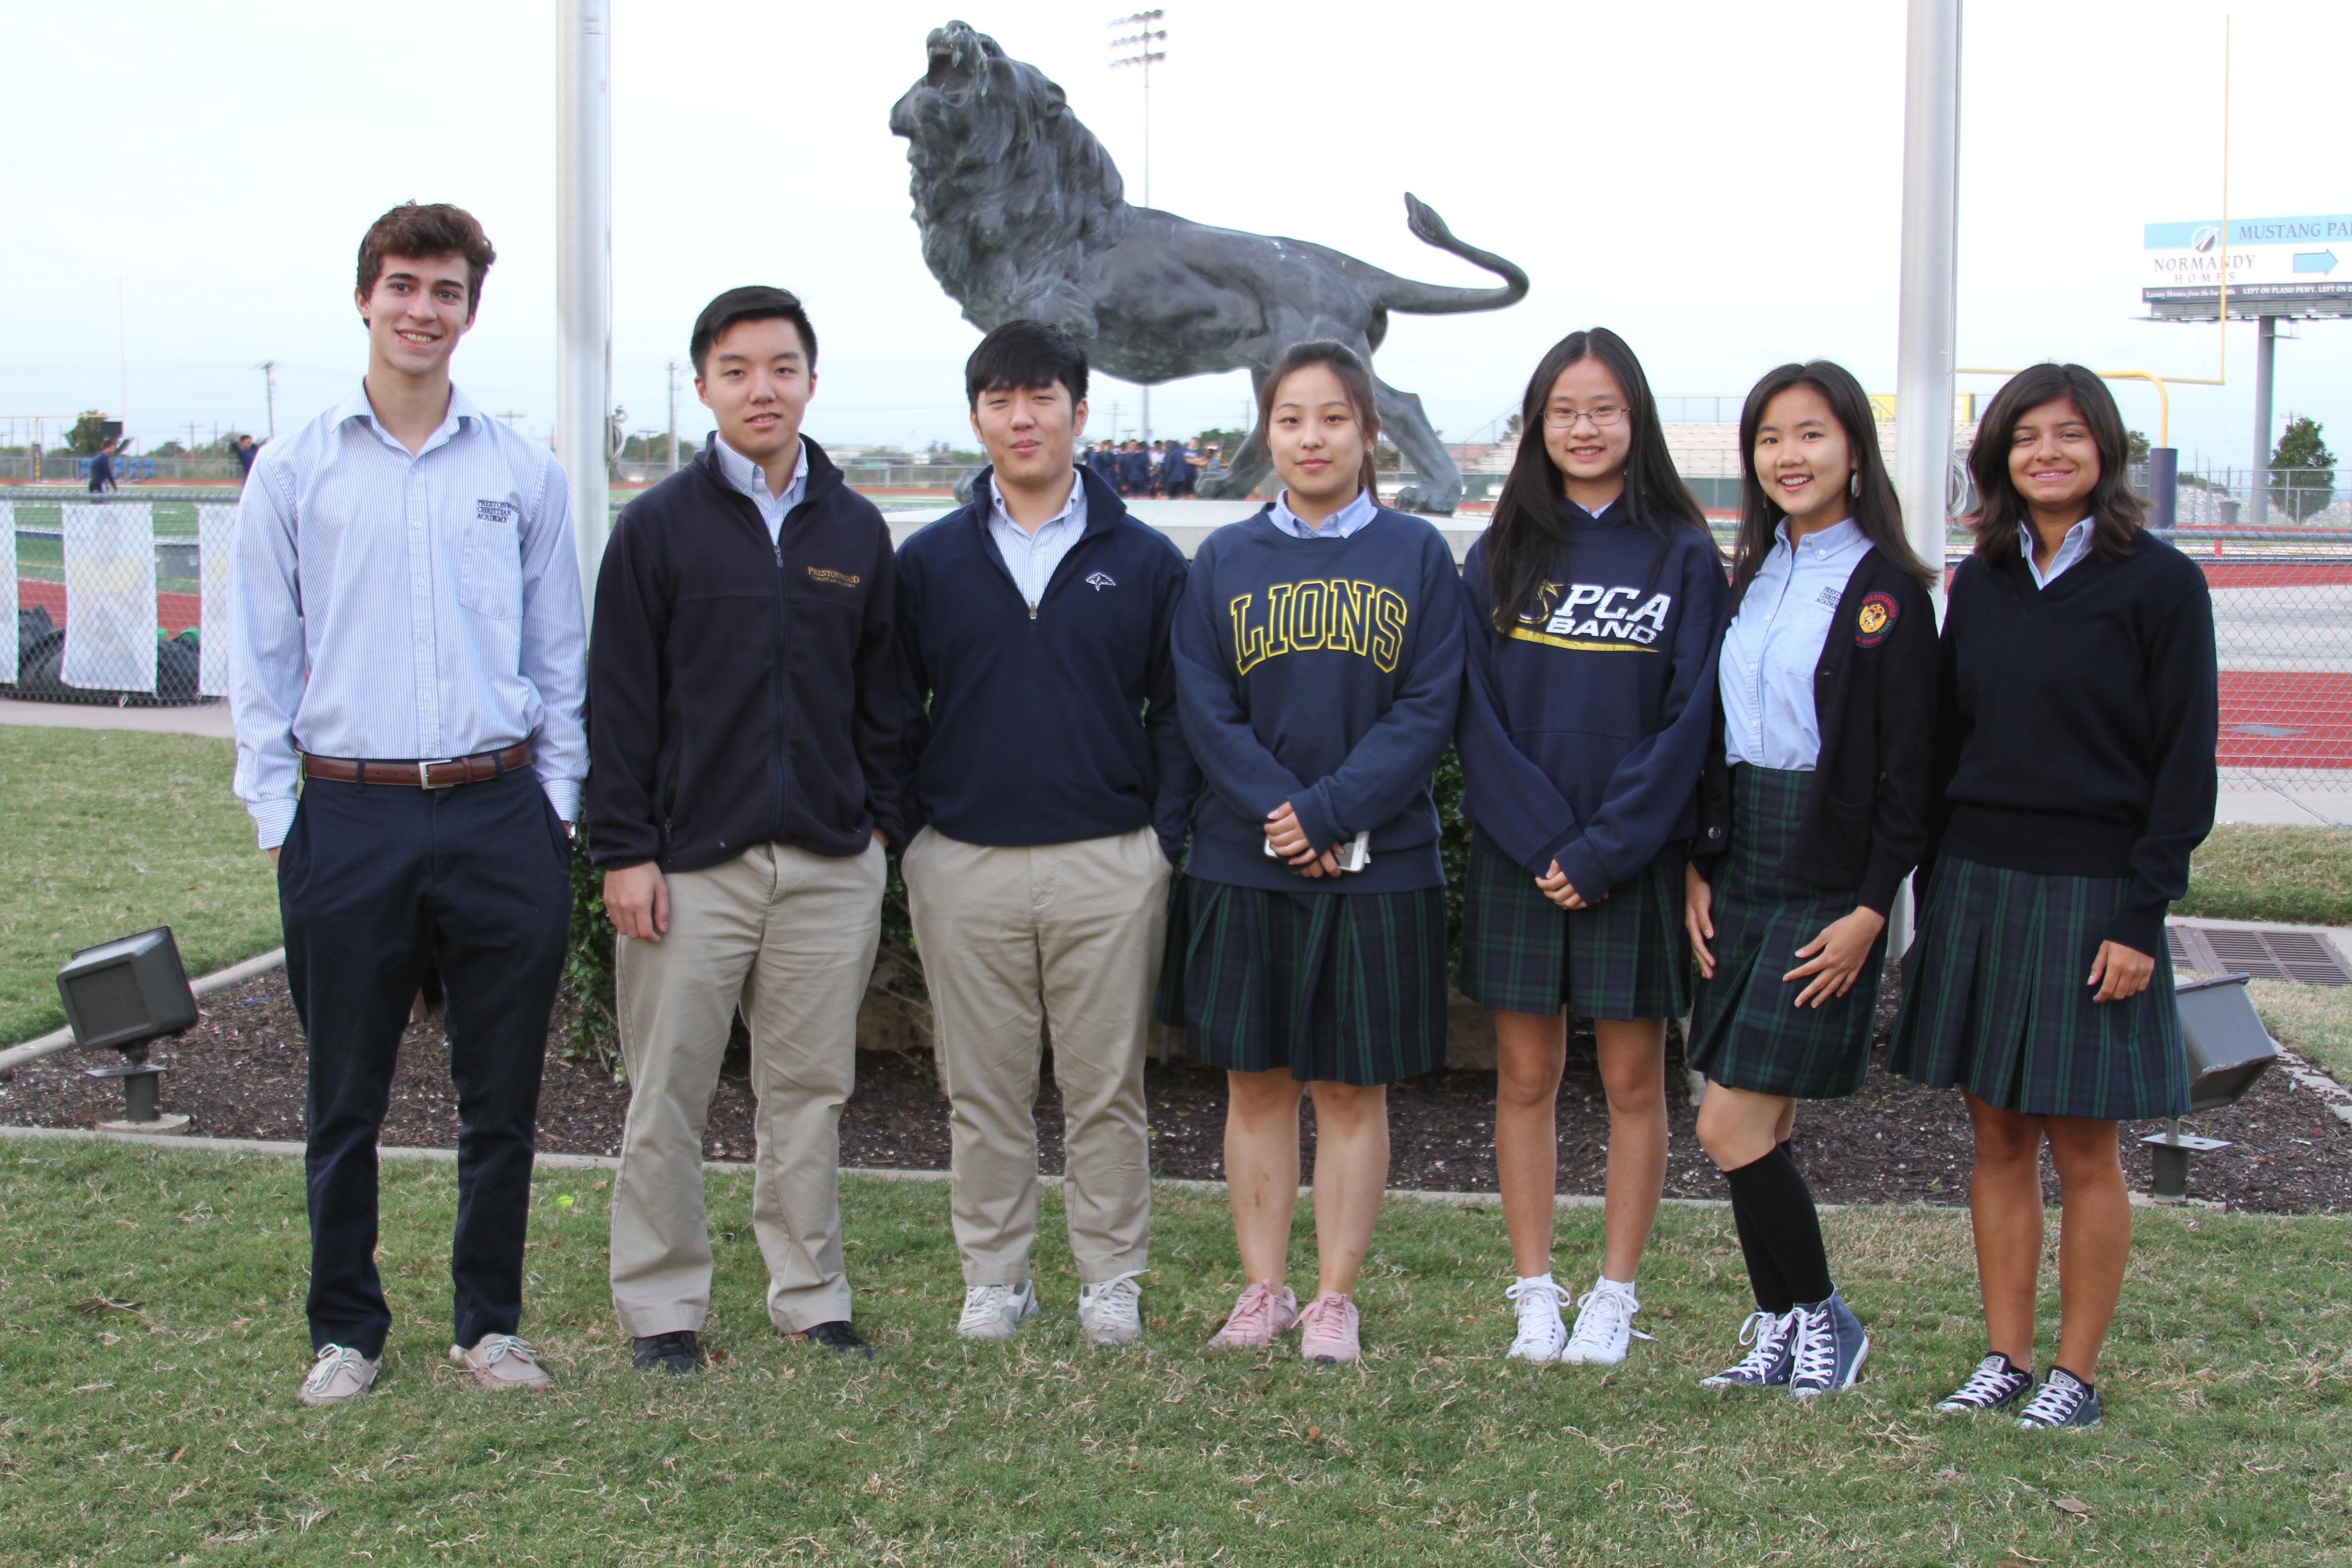 International Student Program - Prestonwood Christian Academy